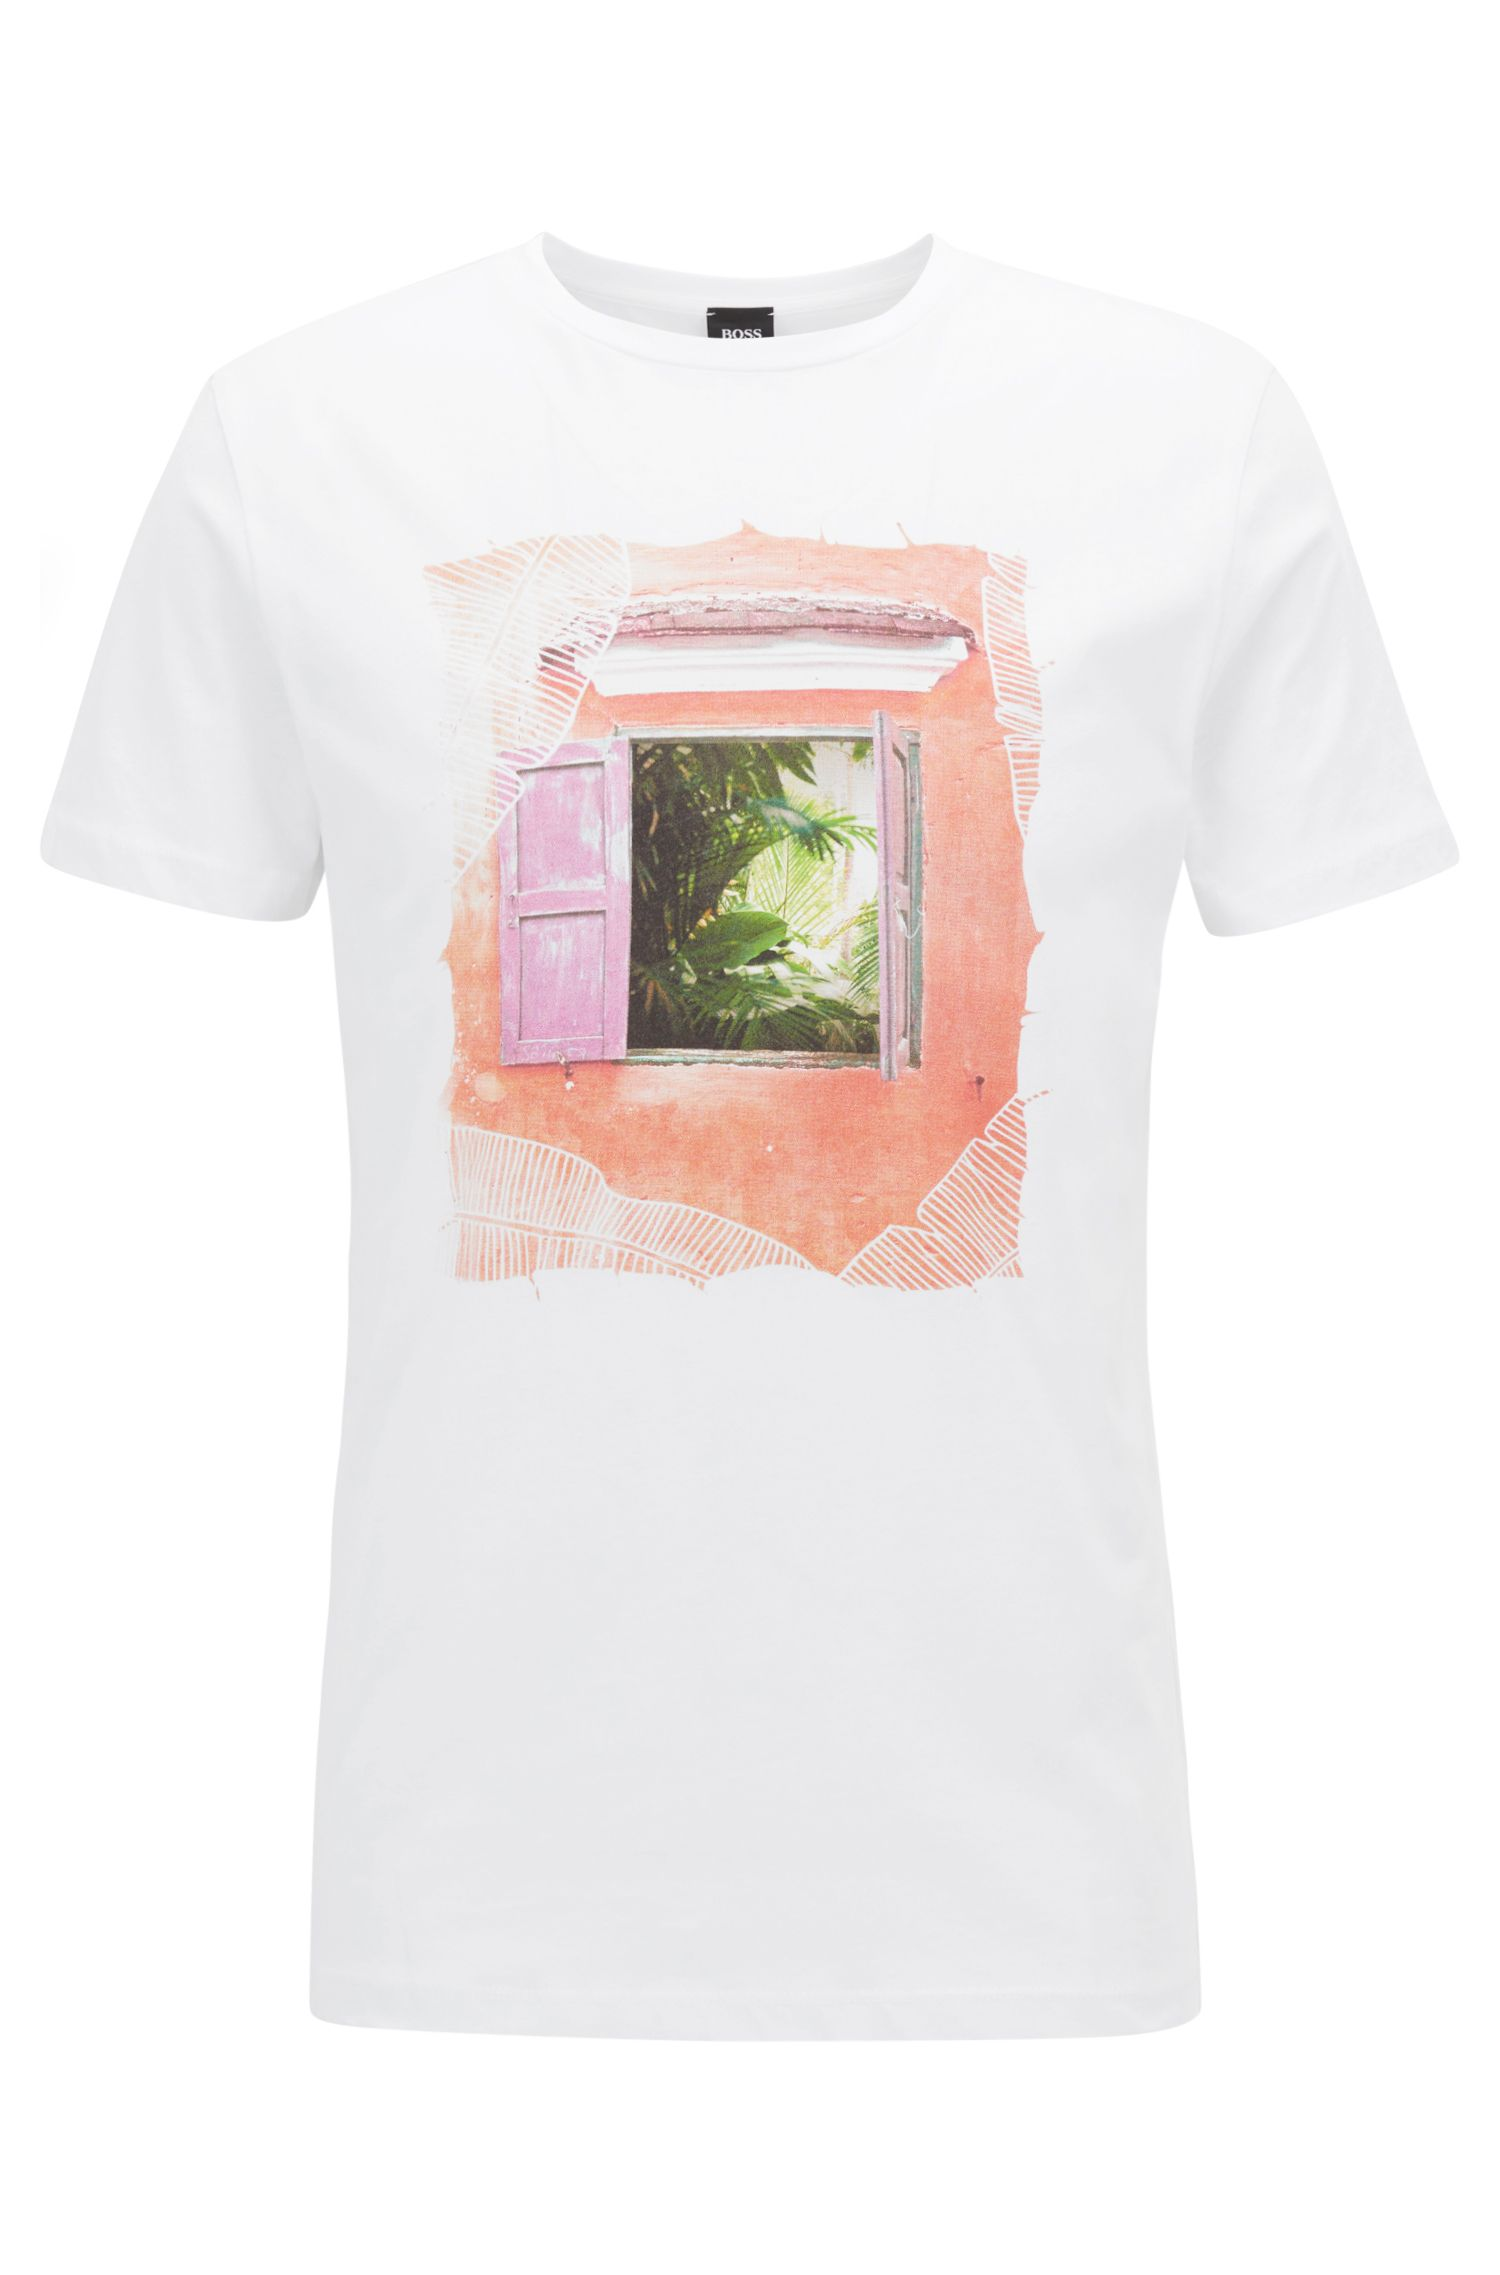 Cuba-Print Cotton Jersey Graphic T-Shirt | Tauno, White